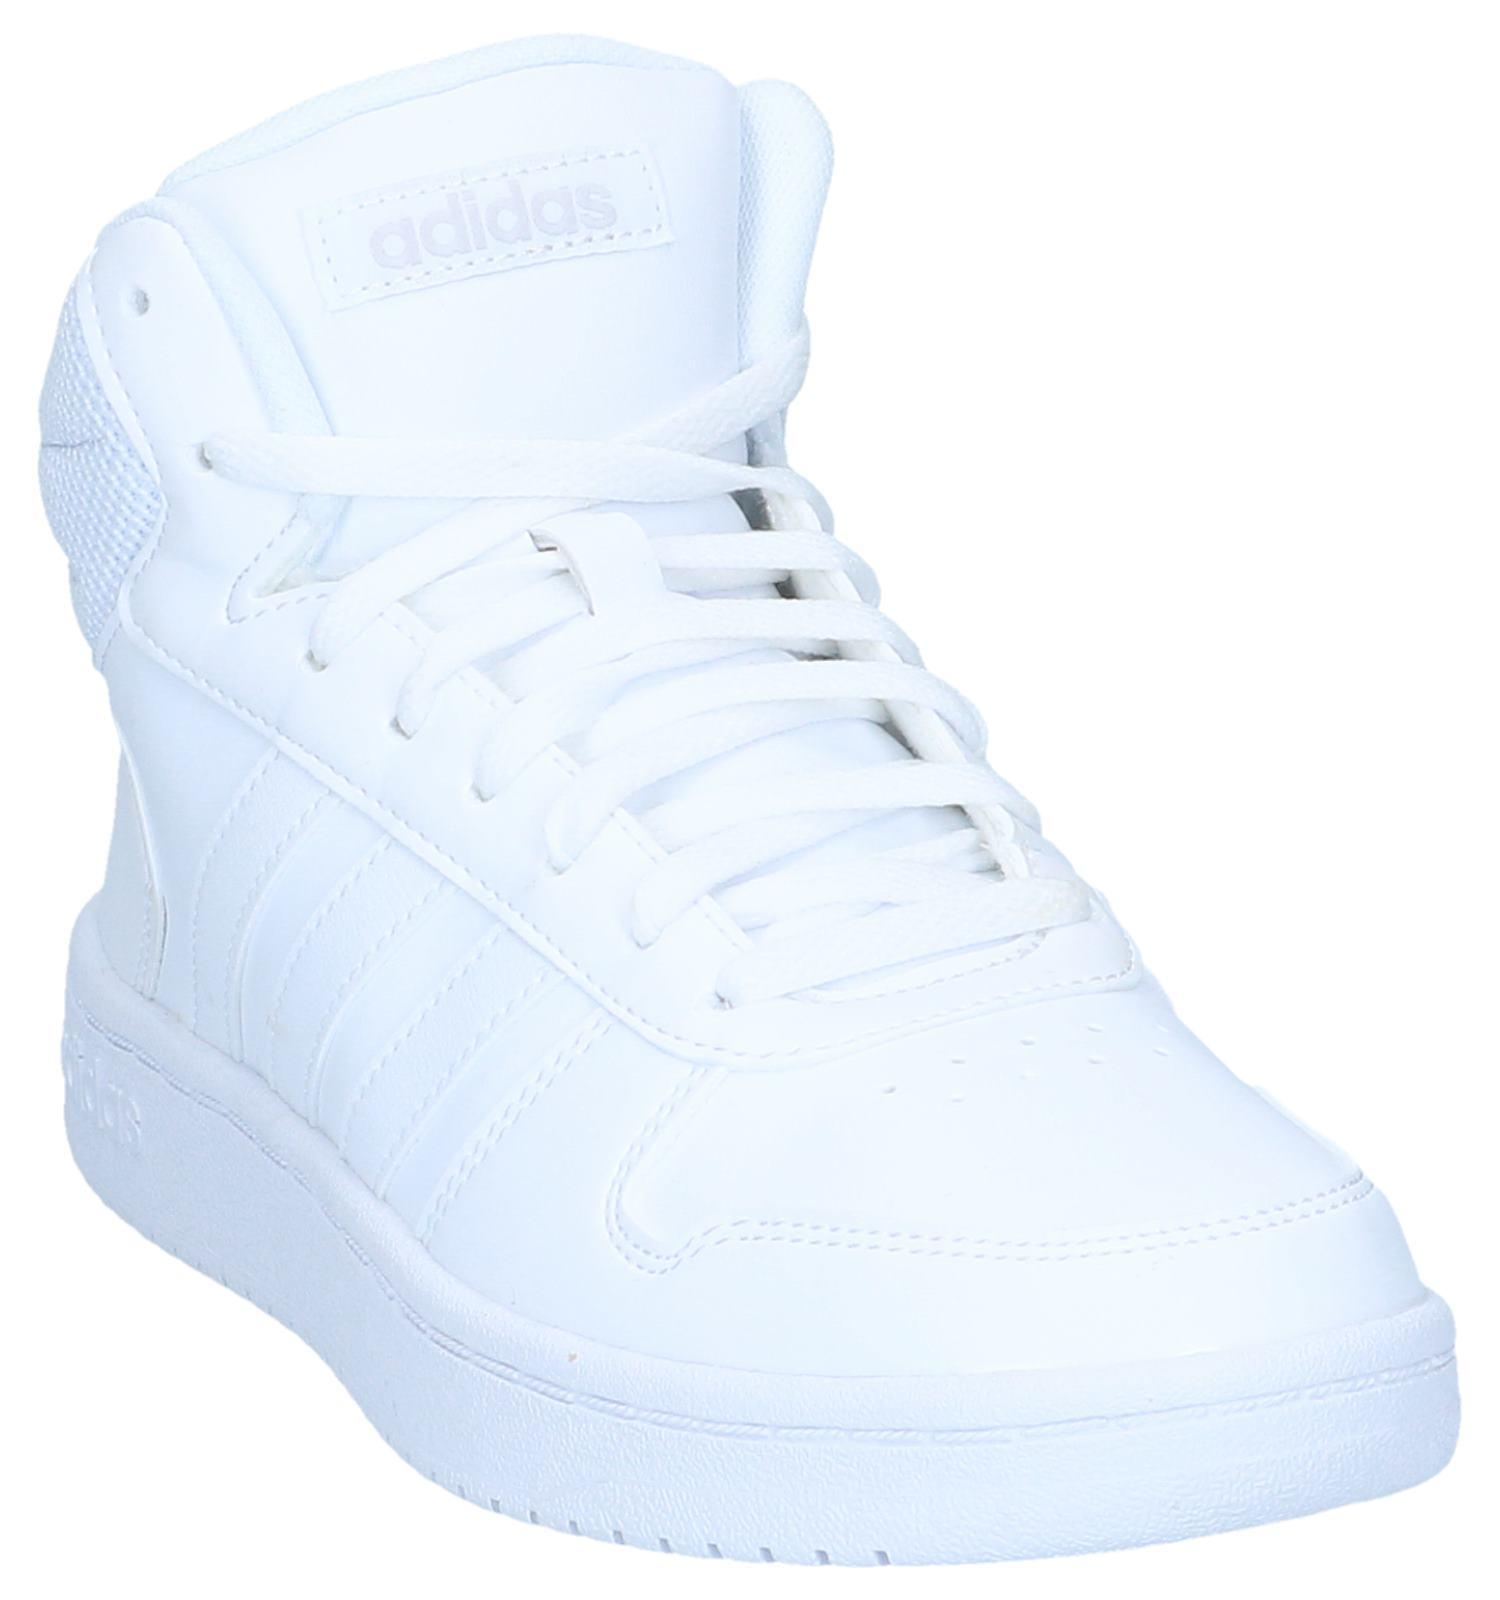 adidas Hoops 2.0 Witte Sneakers | SCHOENENTORFS.NL | Gratis